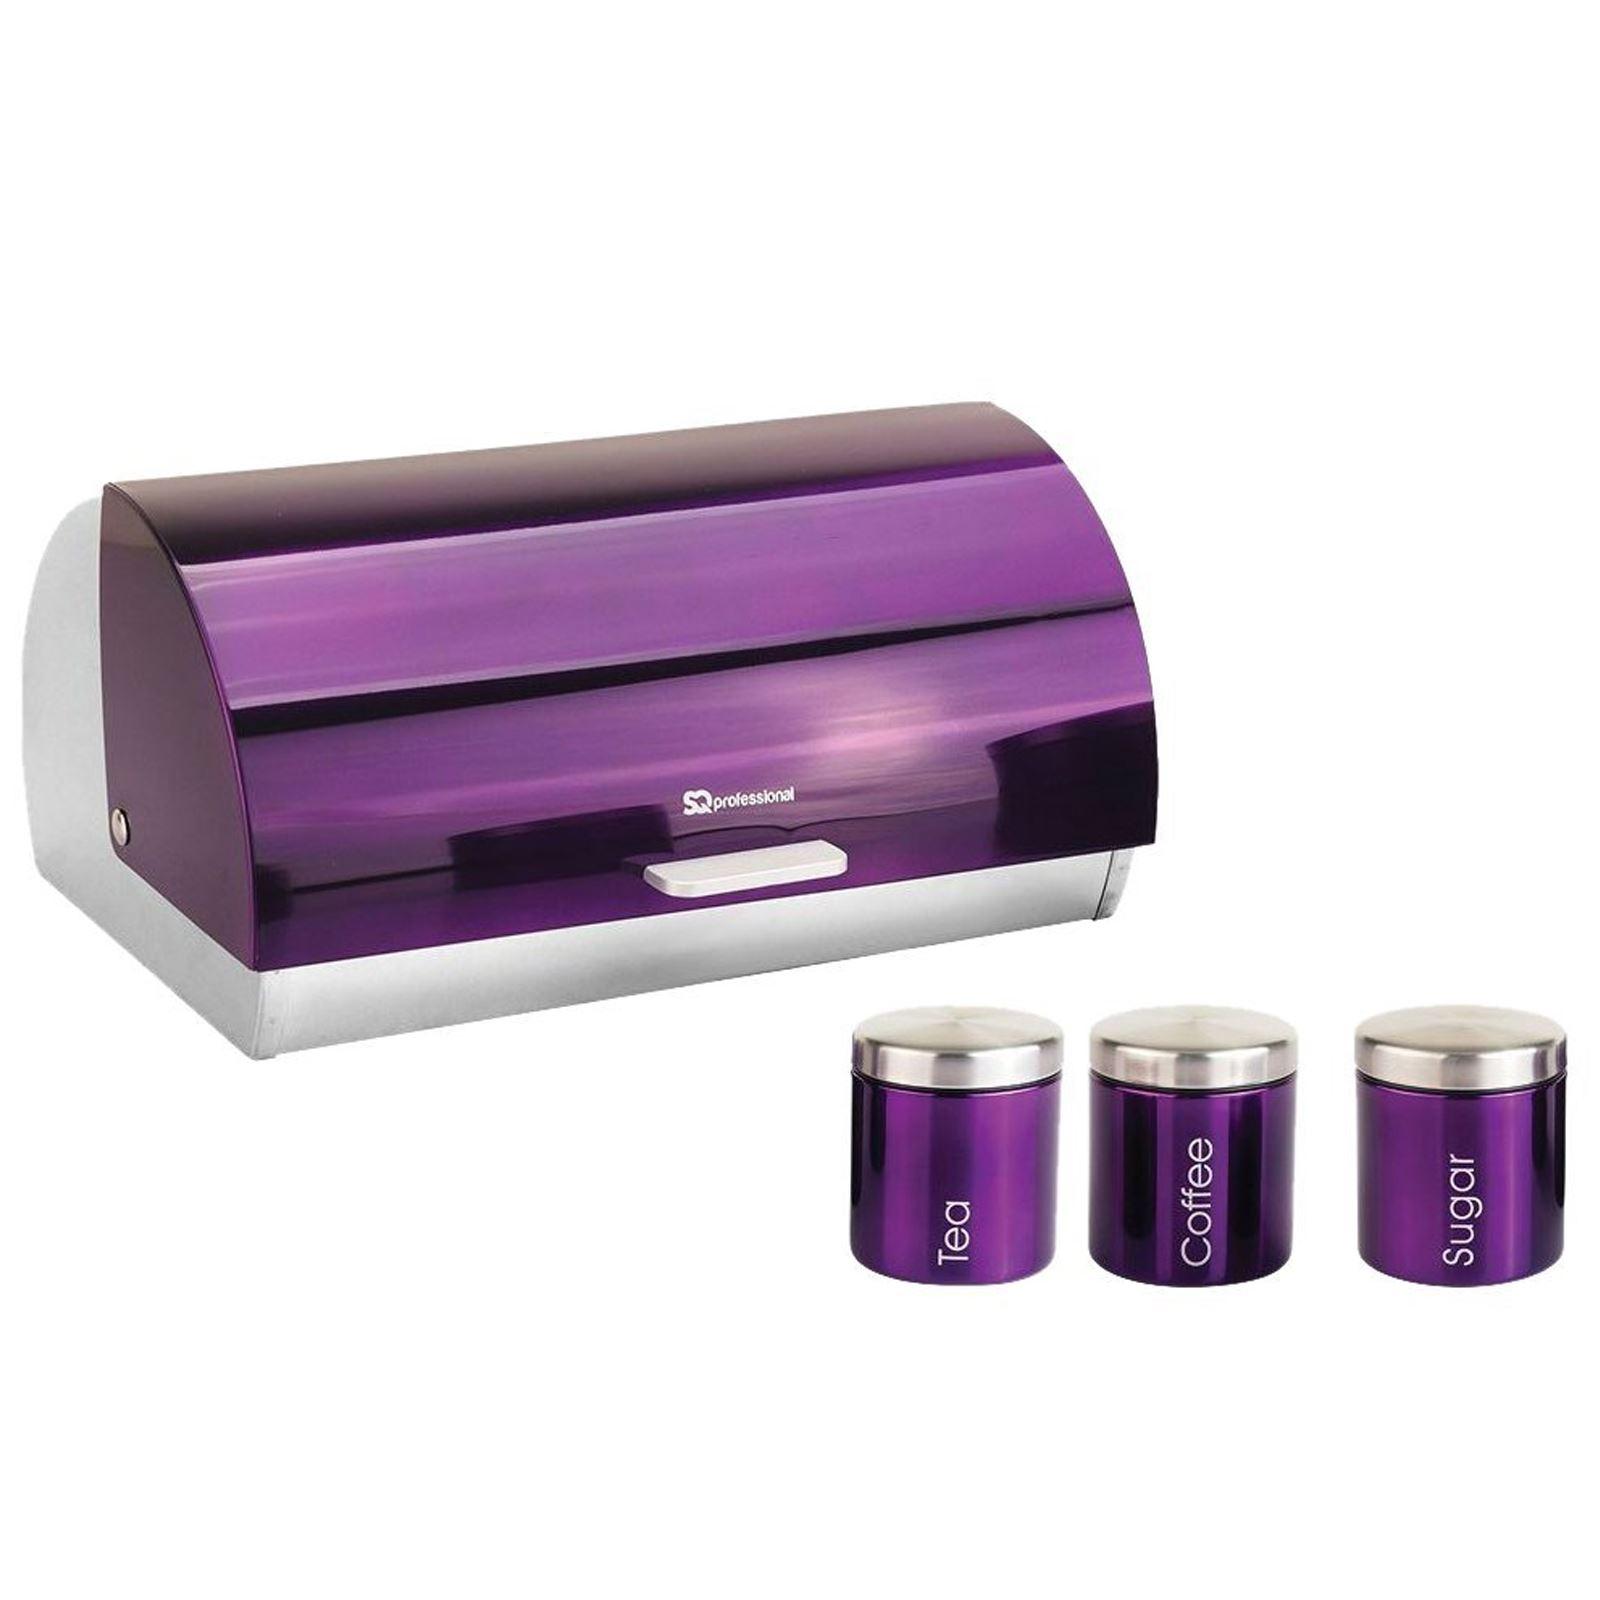 Metallic-Roll-Top-Bread-Bin-Tea-Coffee-Sugar-Jar-Canister-Sets-Kitchen-Storage thumbnail 21